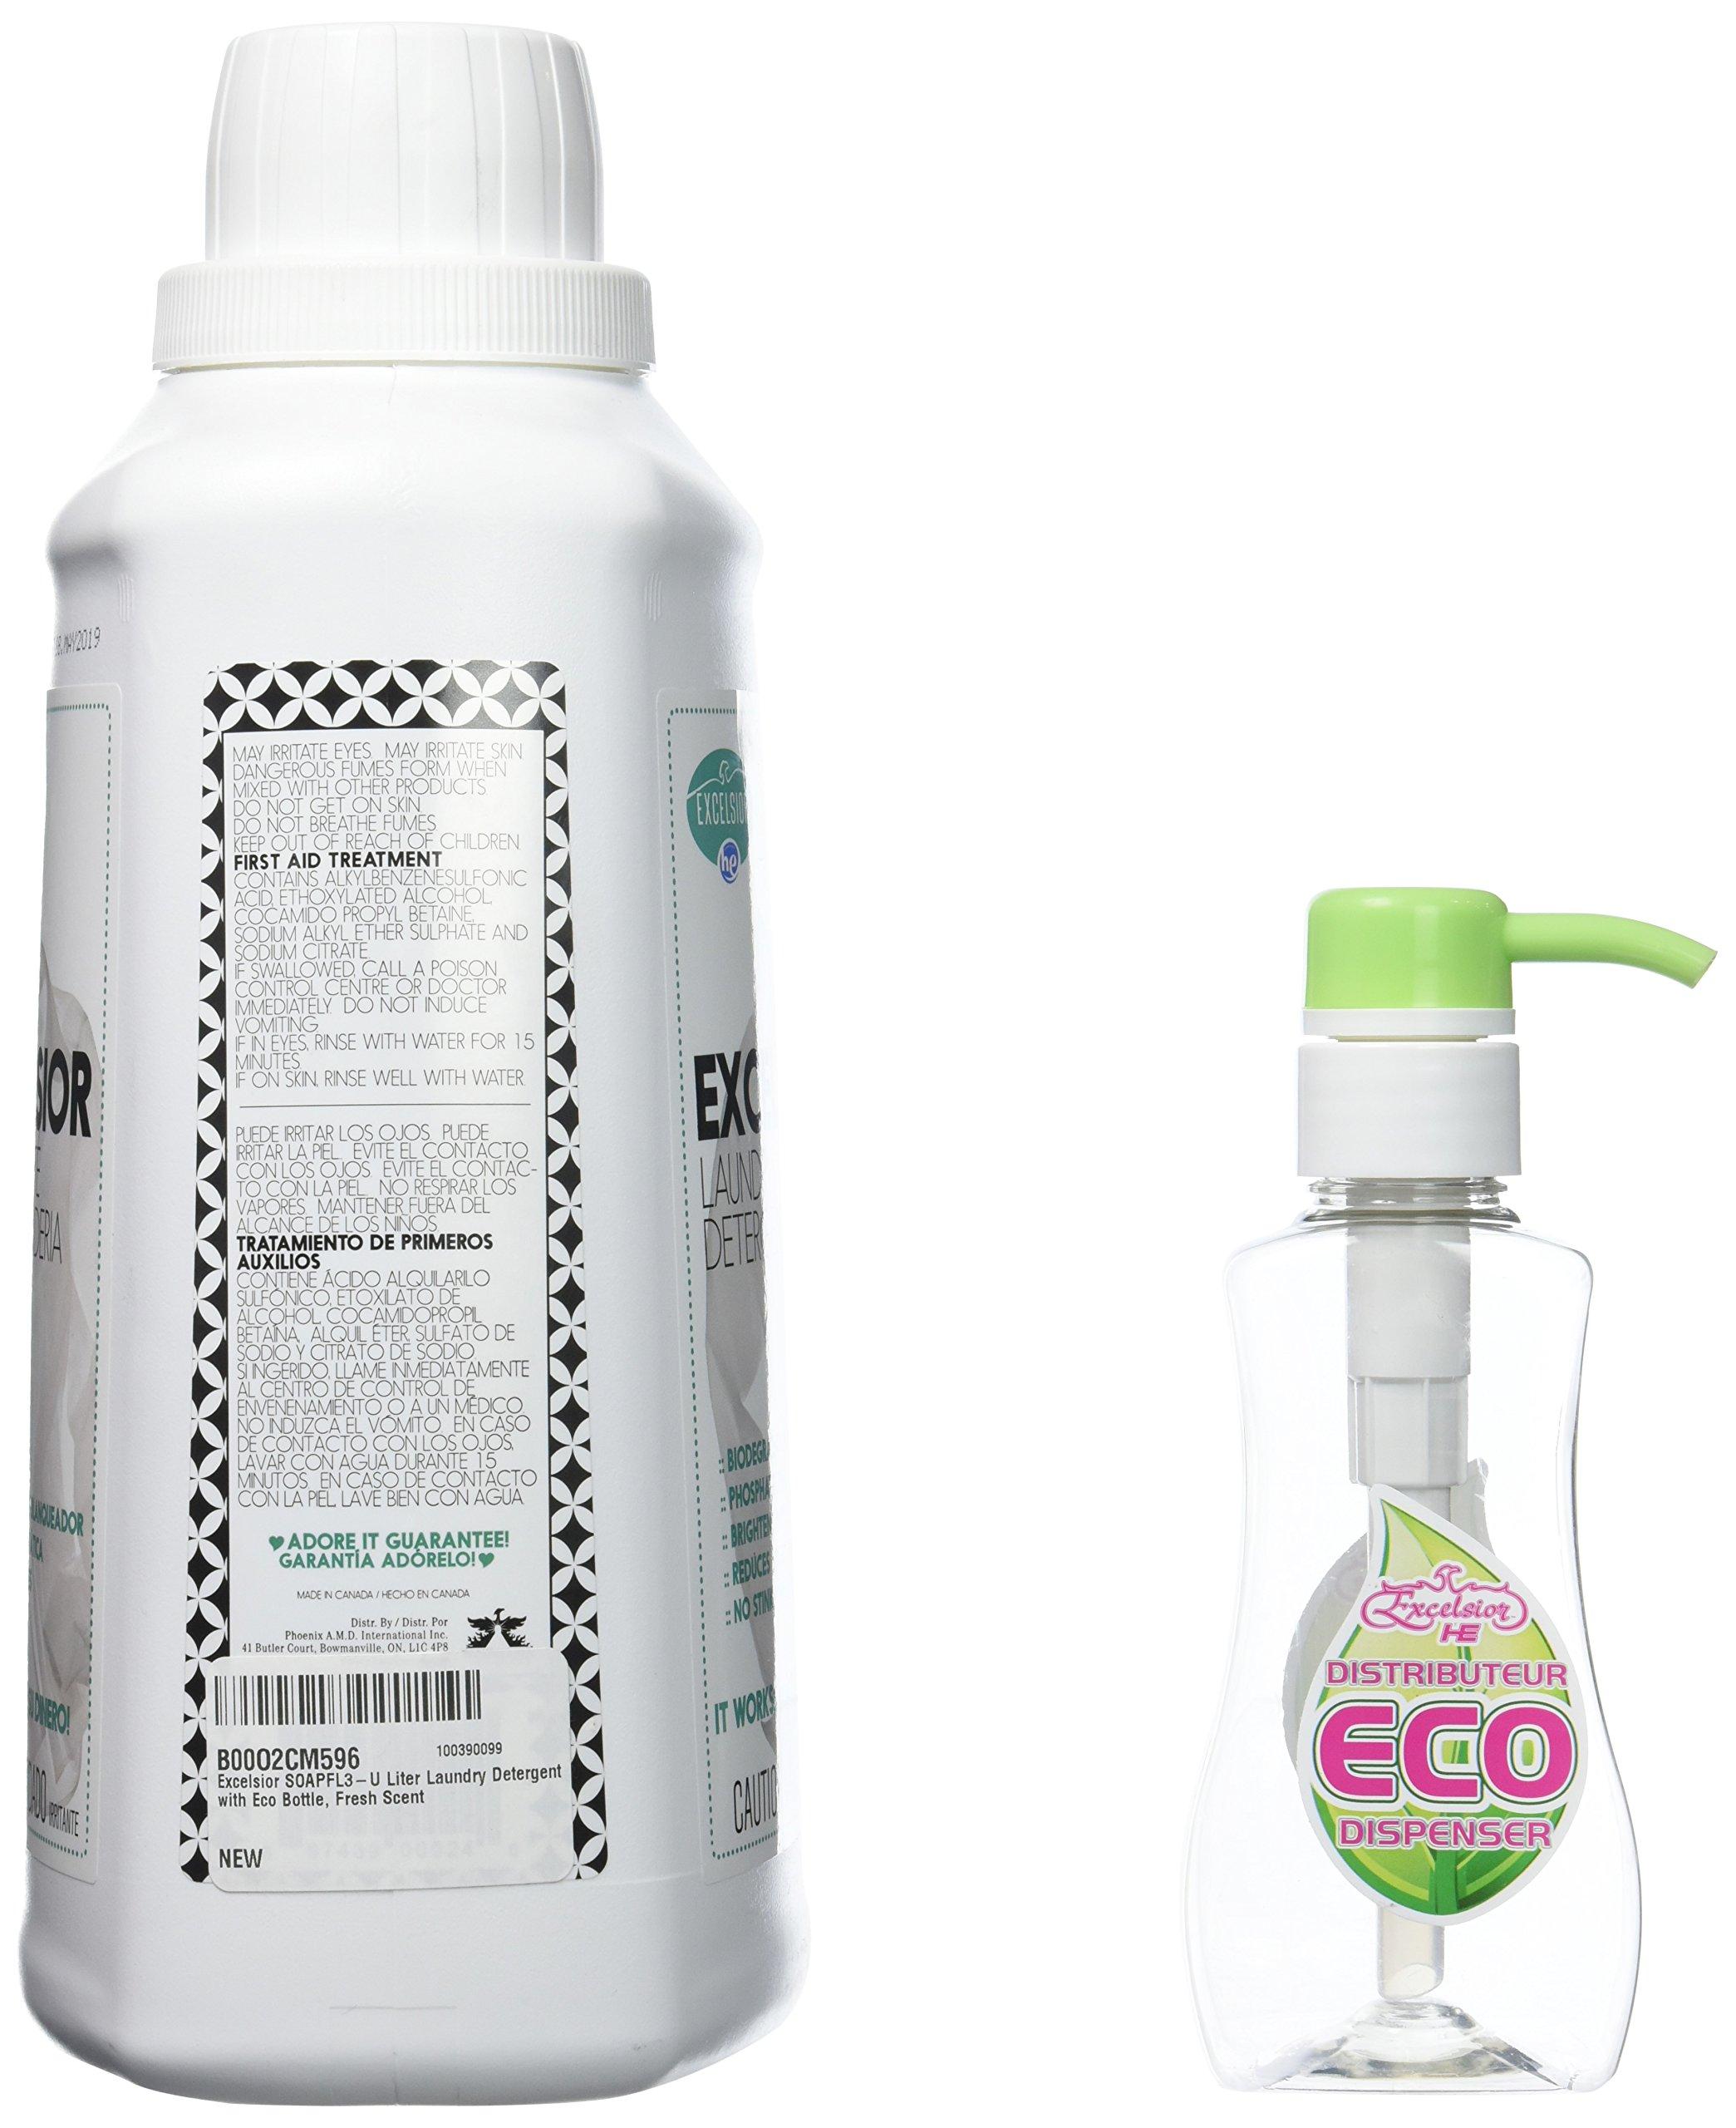 Excelsior Soapfl3 U Liter Laundry Detergent With Eco